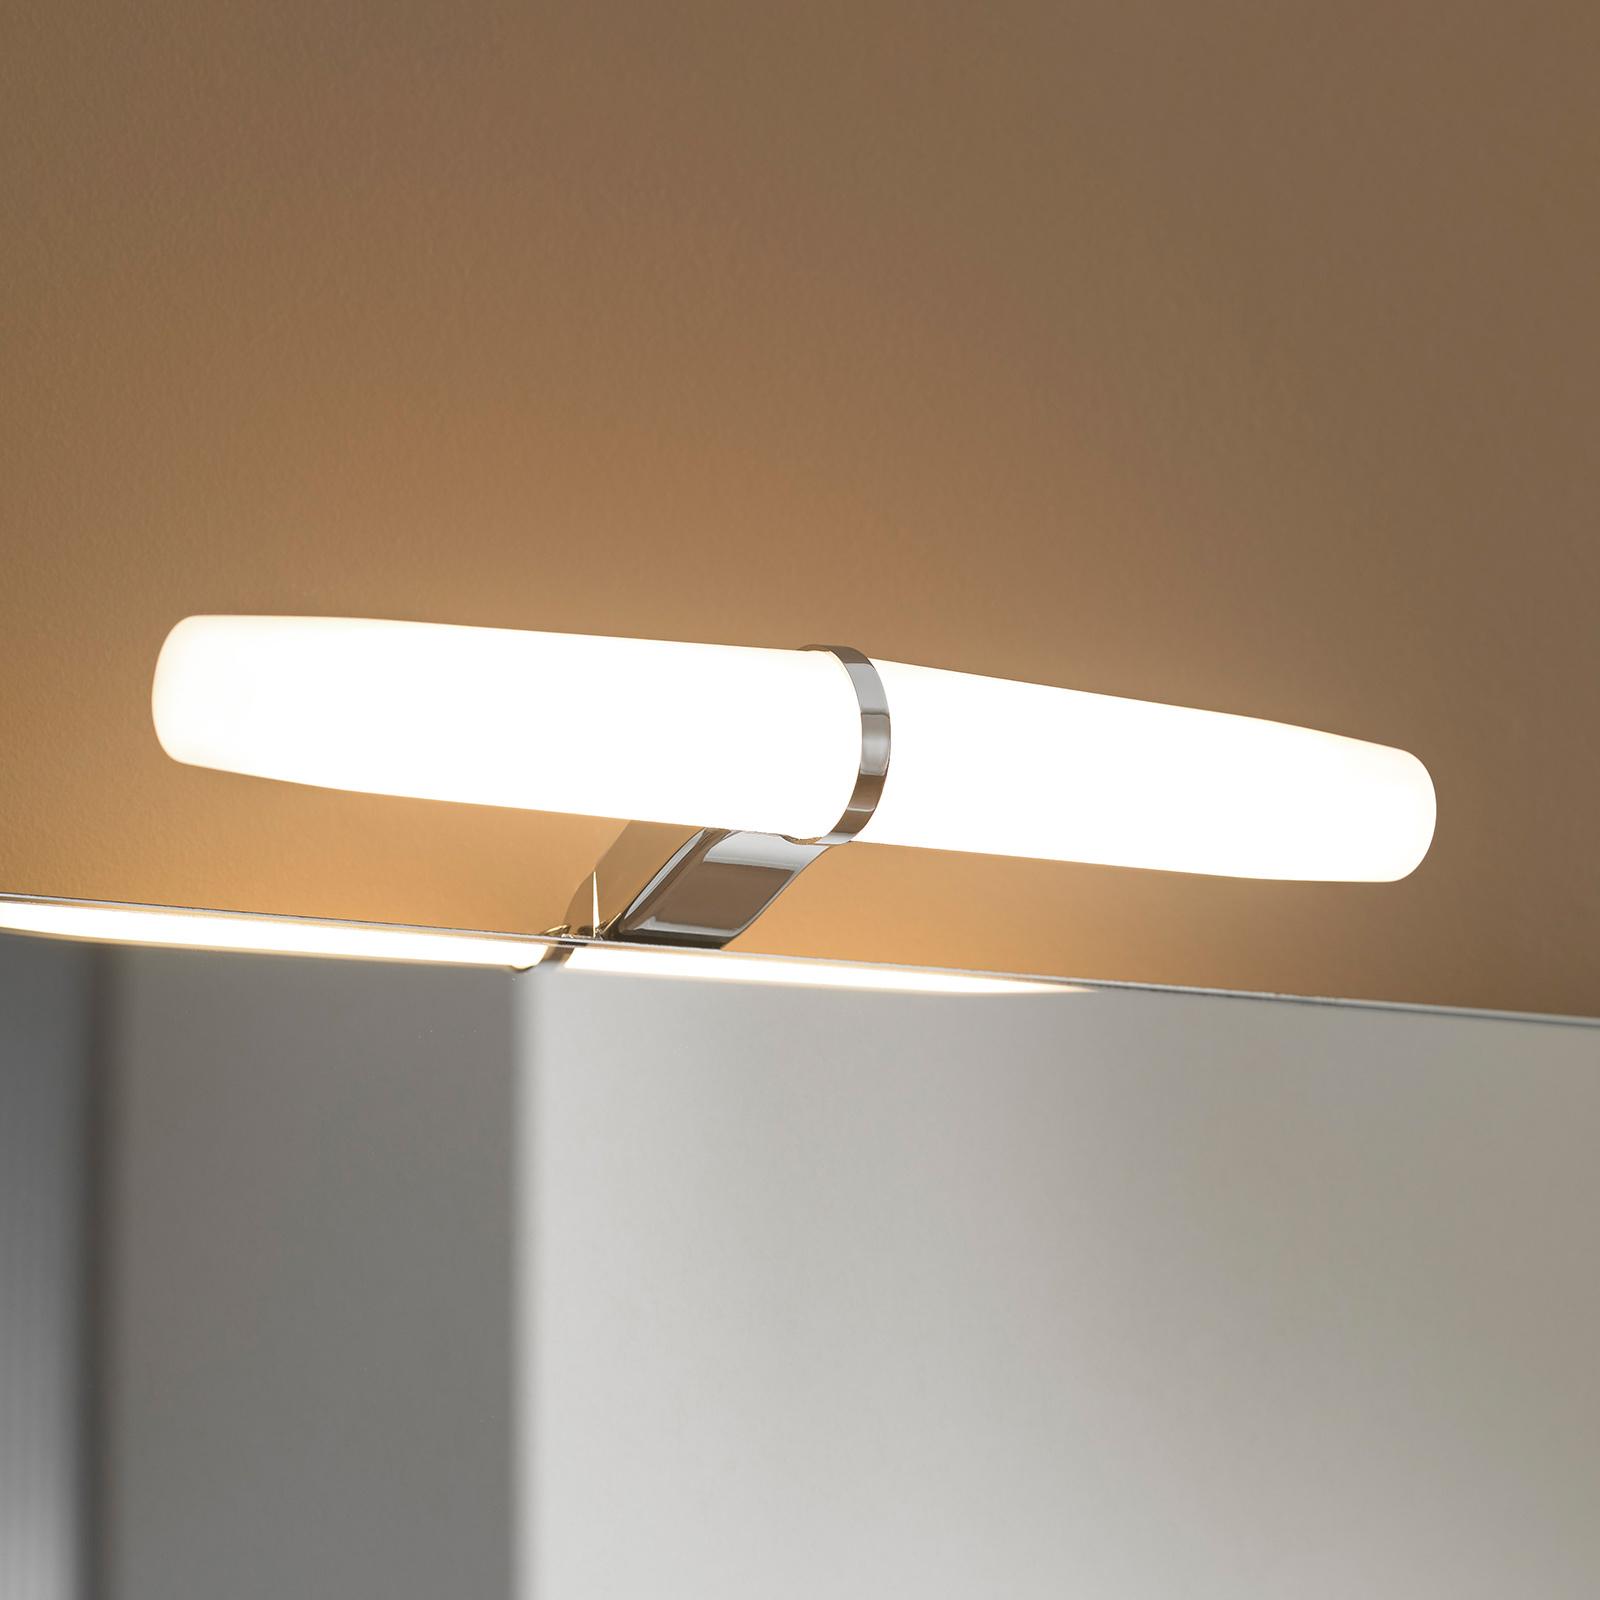 Luce per specchio a LED Eva 2, bianco neutro